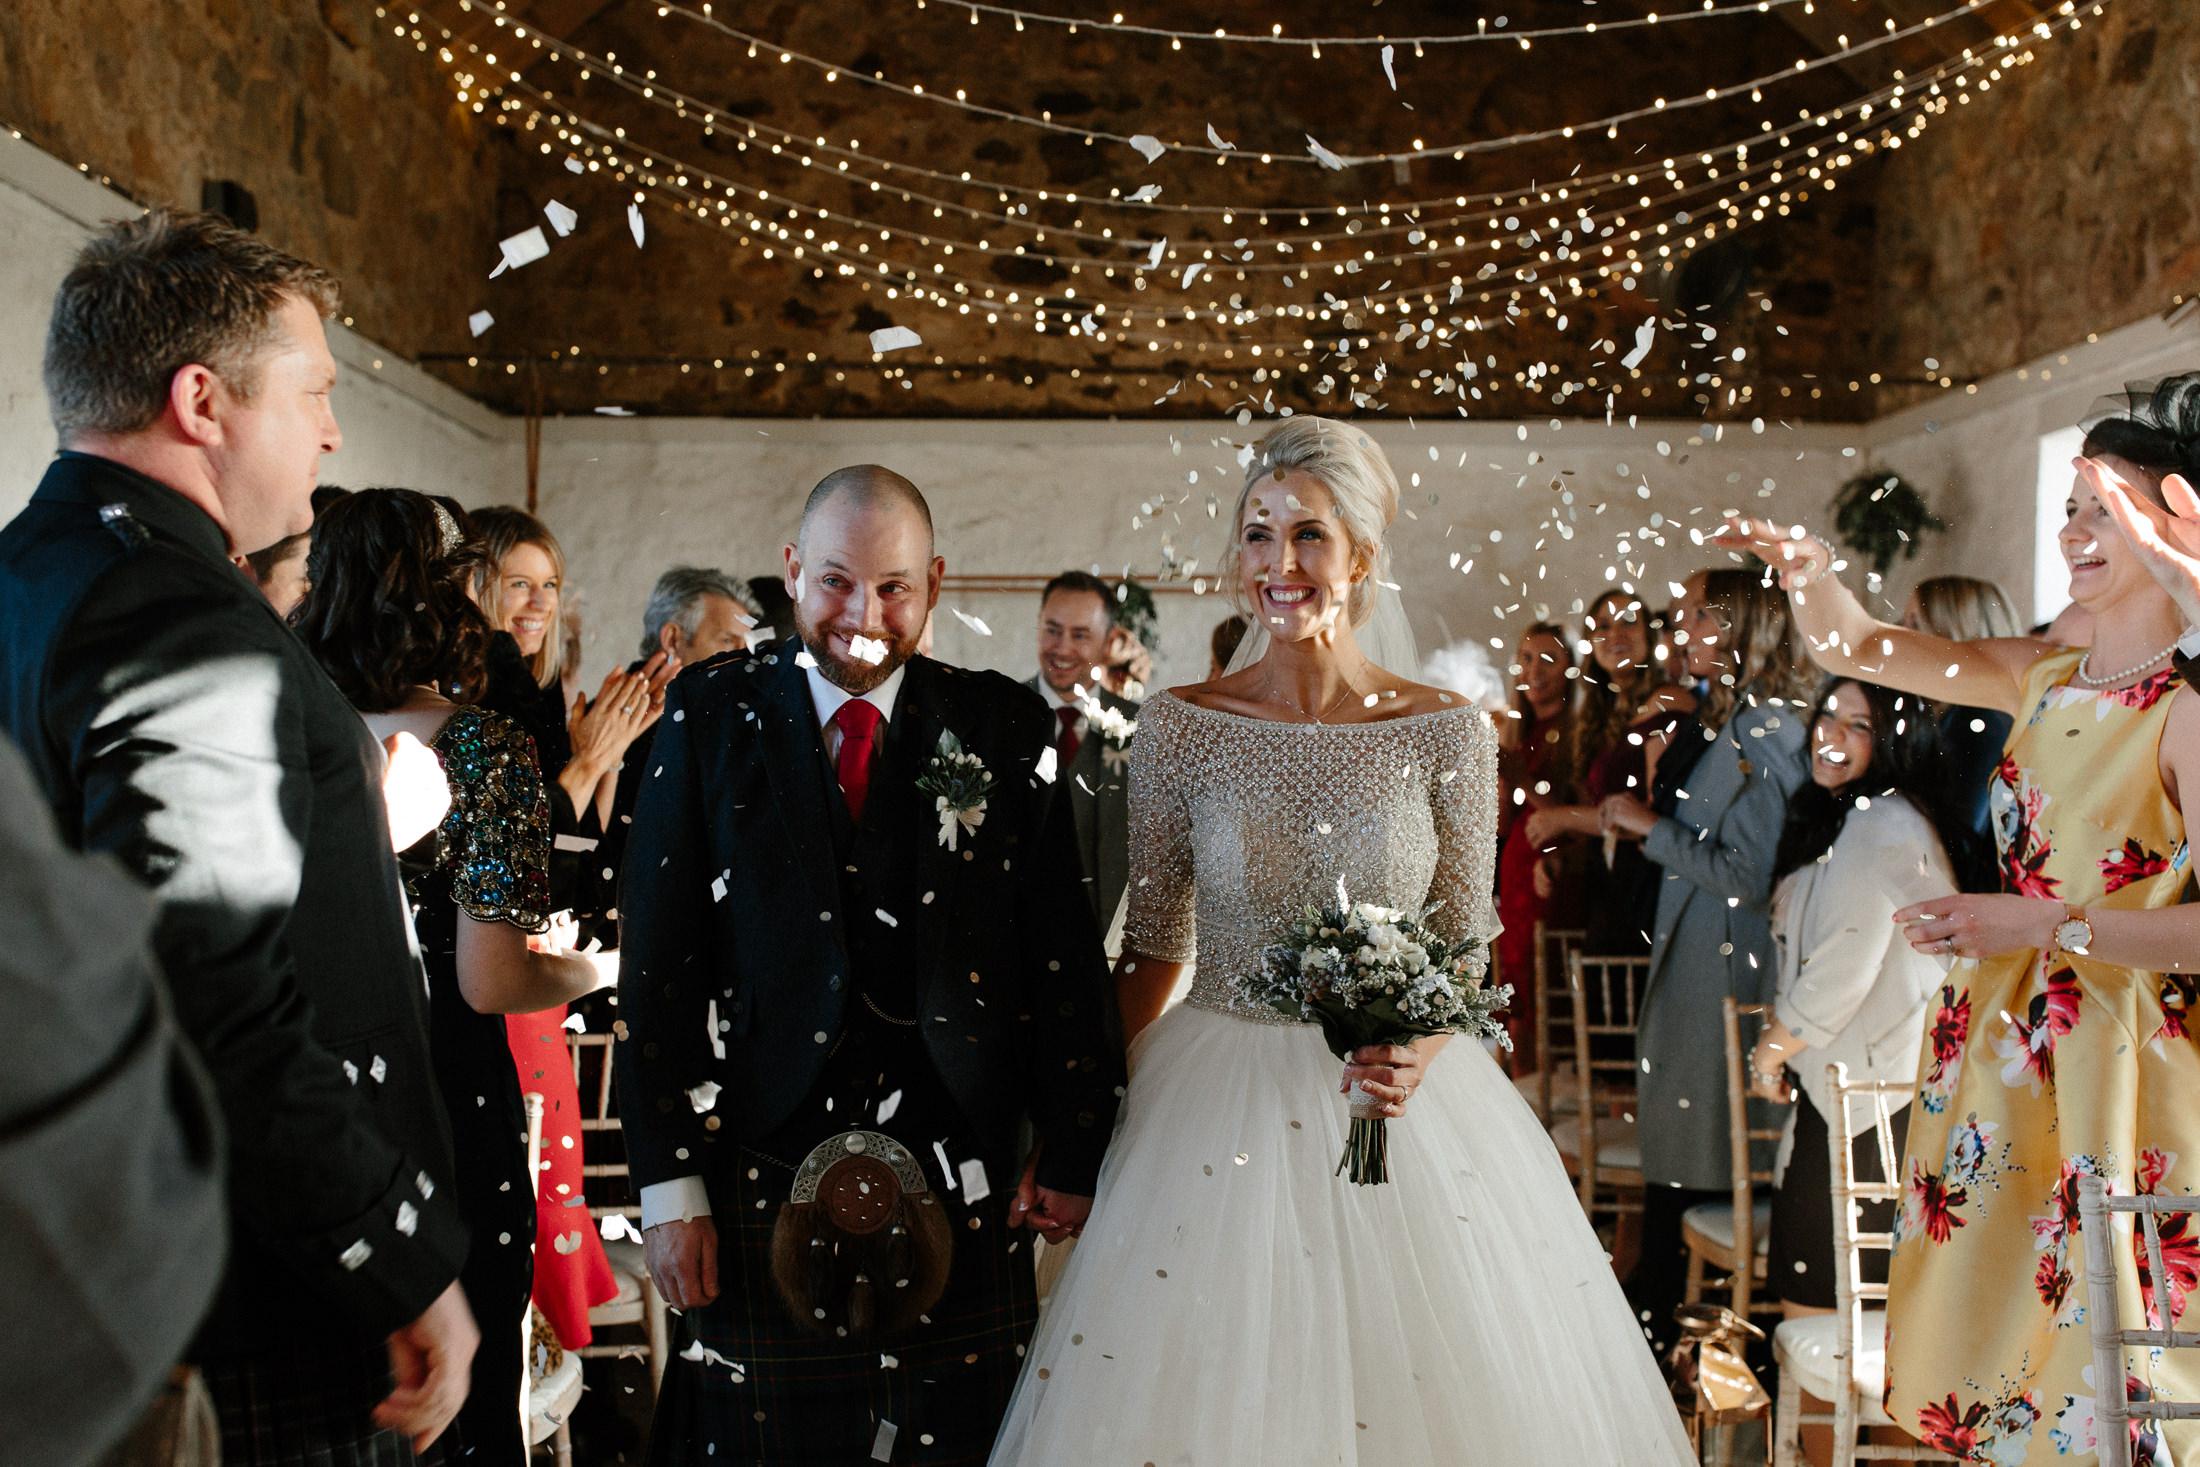 Kayleigh-Michael-Cow-Shed-Cowshed-Crail-Fife-Coastal-Rustic-Barn-Lianne-Mackay-Wedding-Photography-Photographer-Edinburgh-Glasgow-Scotland-WEB-RES-308.jpg